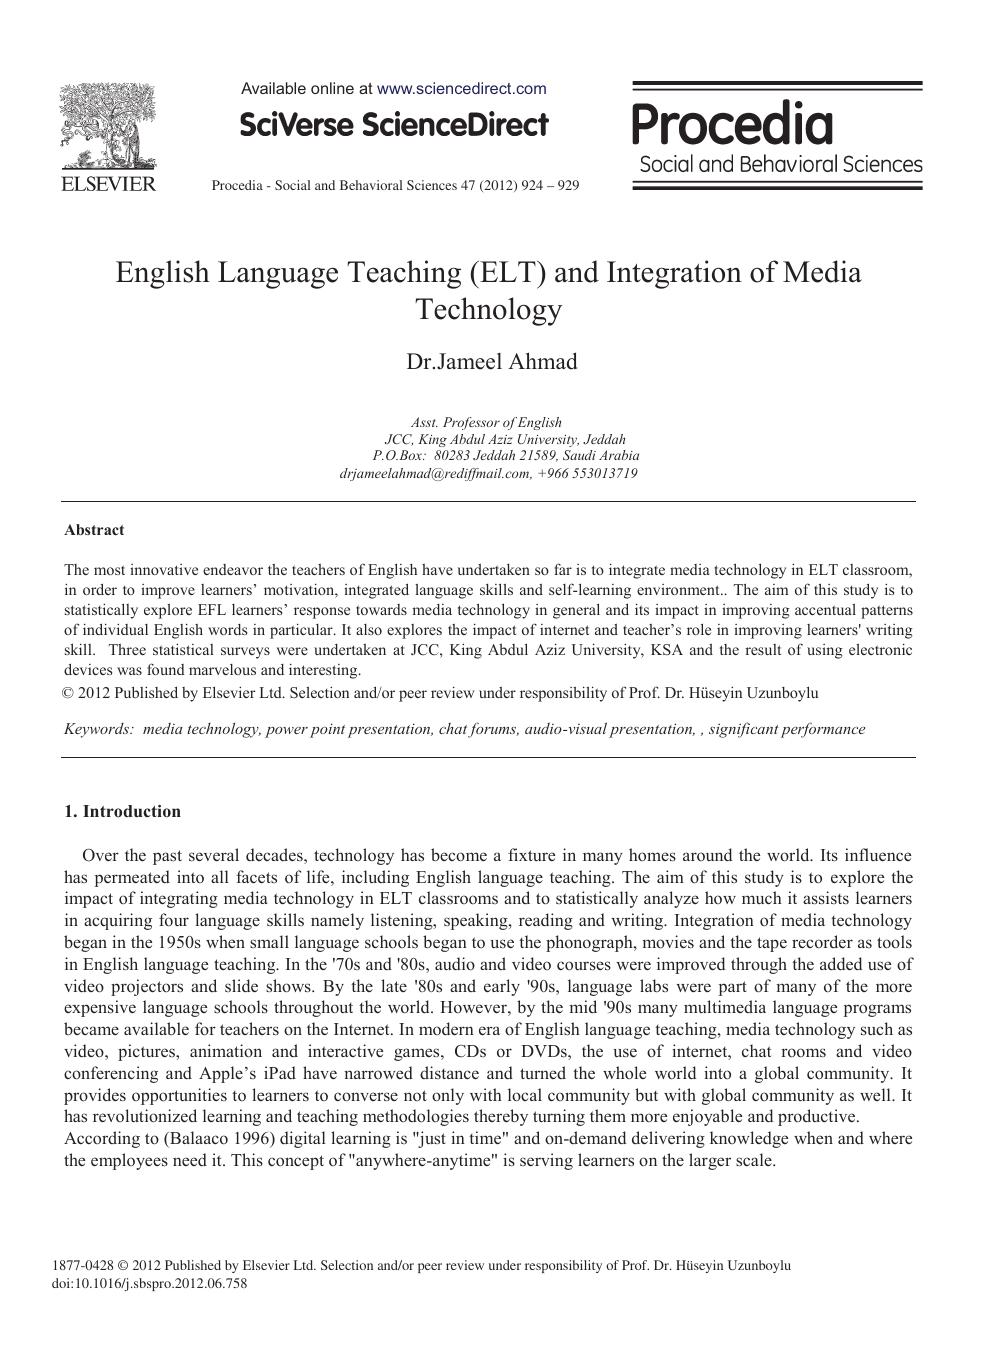 English Language Teaching (ELT) and Integration of Media